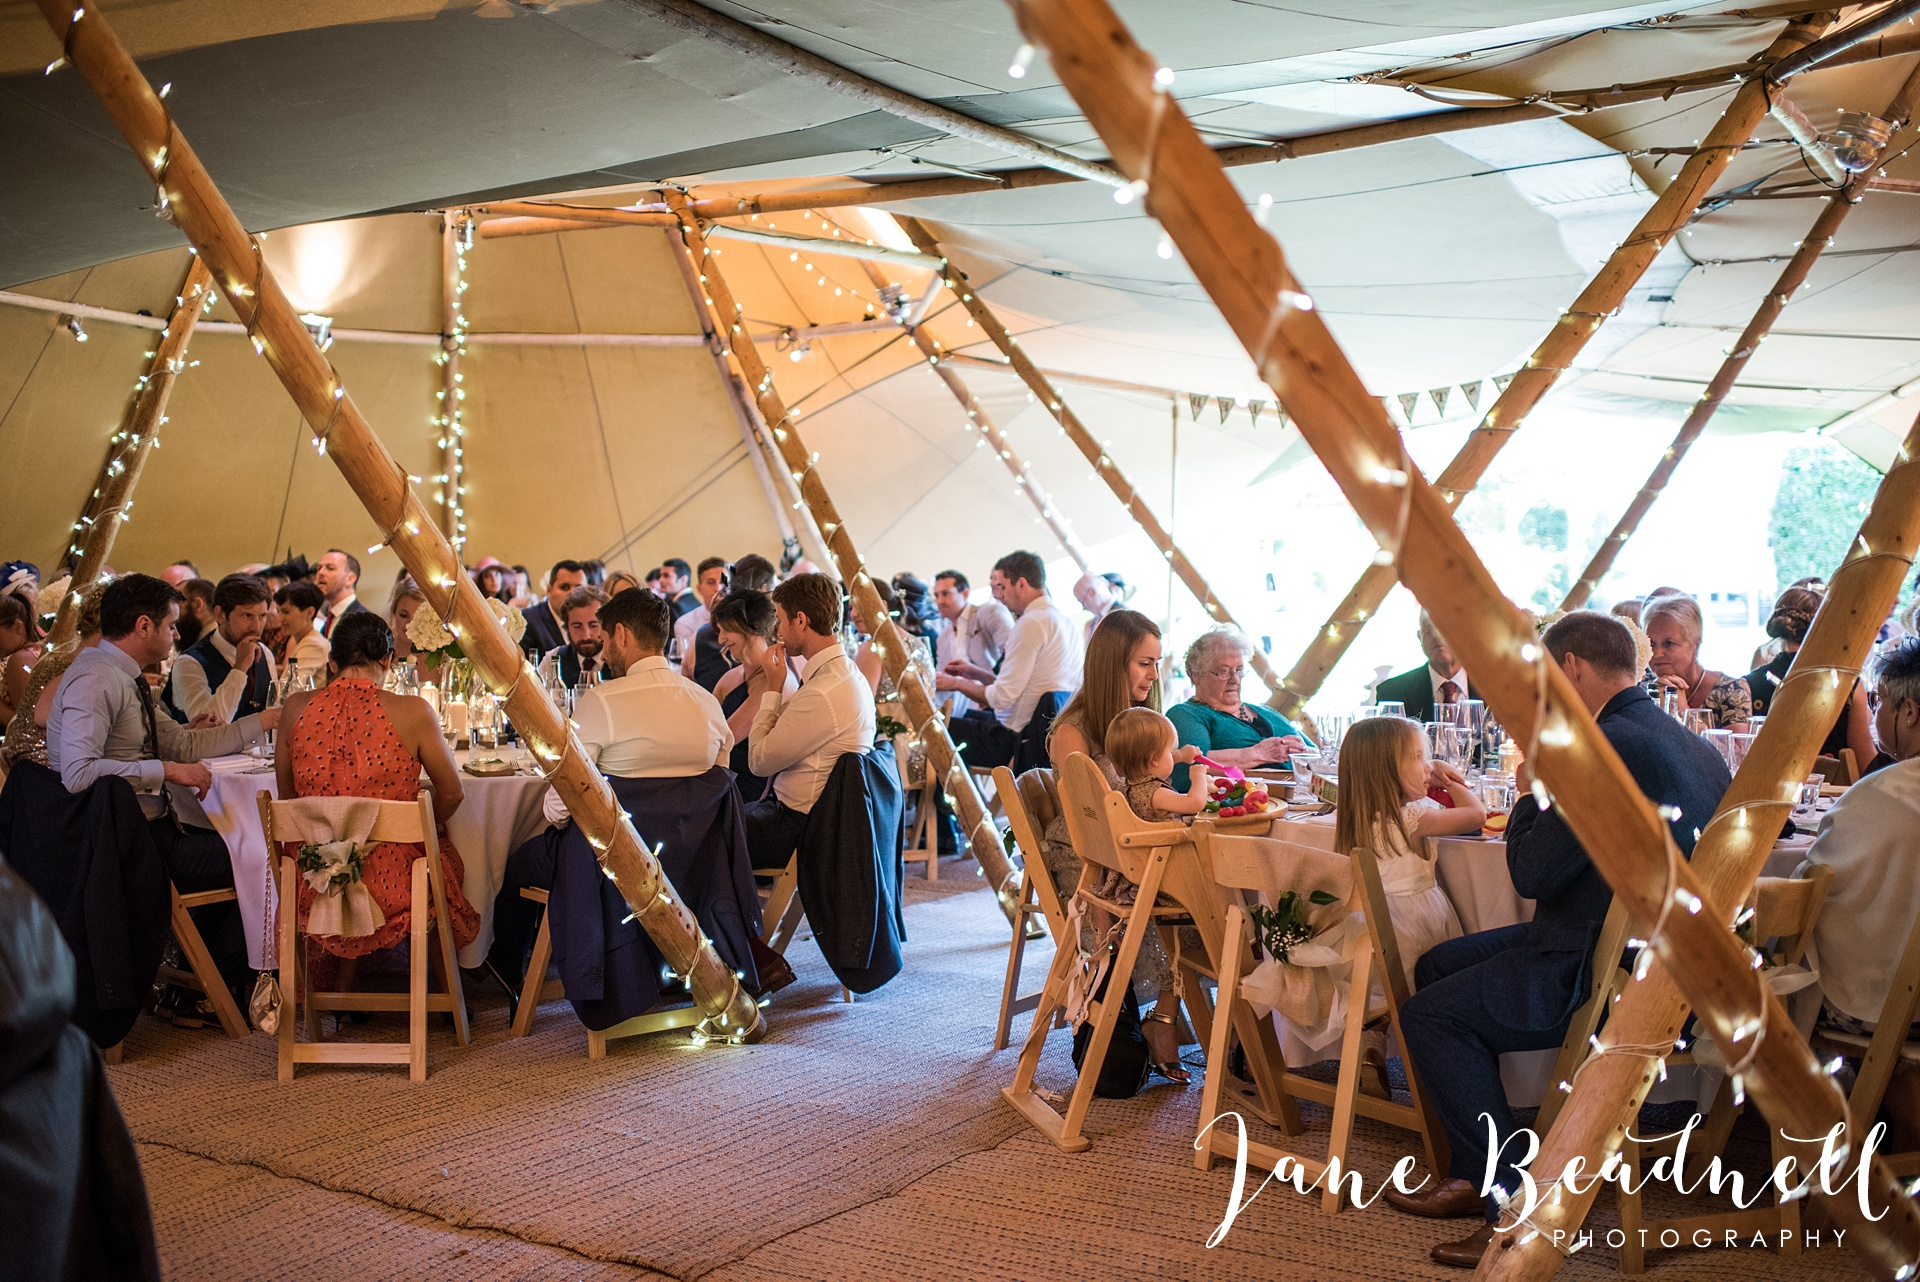 fine-art-wedding-photographer-jane-beadnell-yorkshire-wedding-photographer_0126